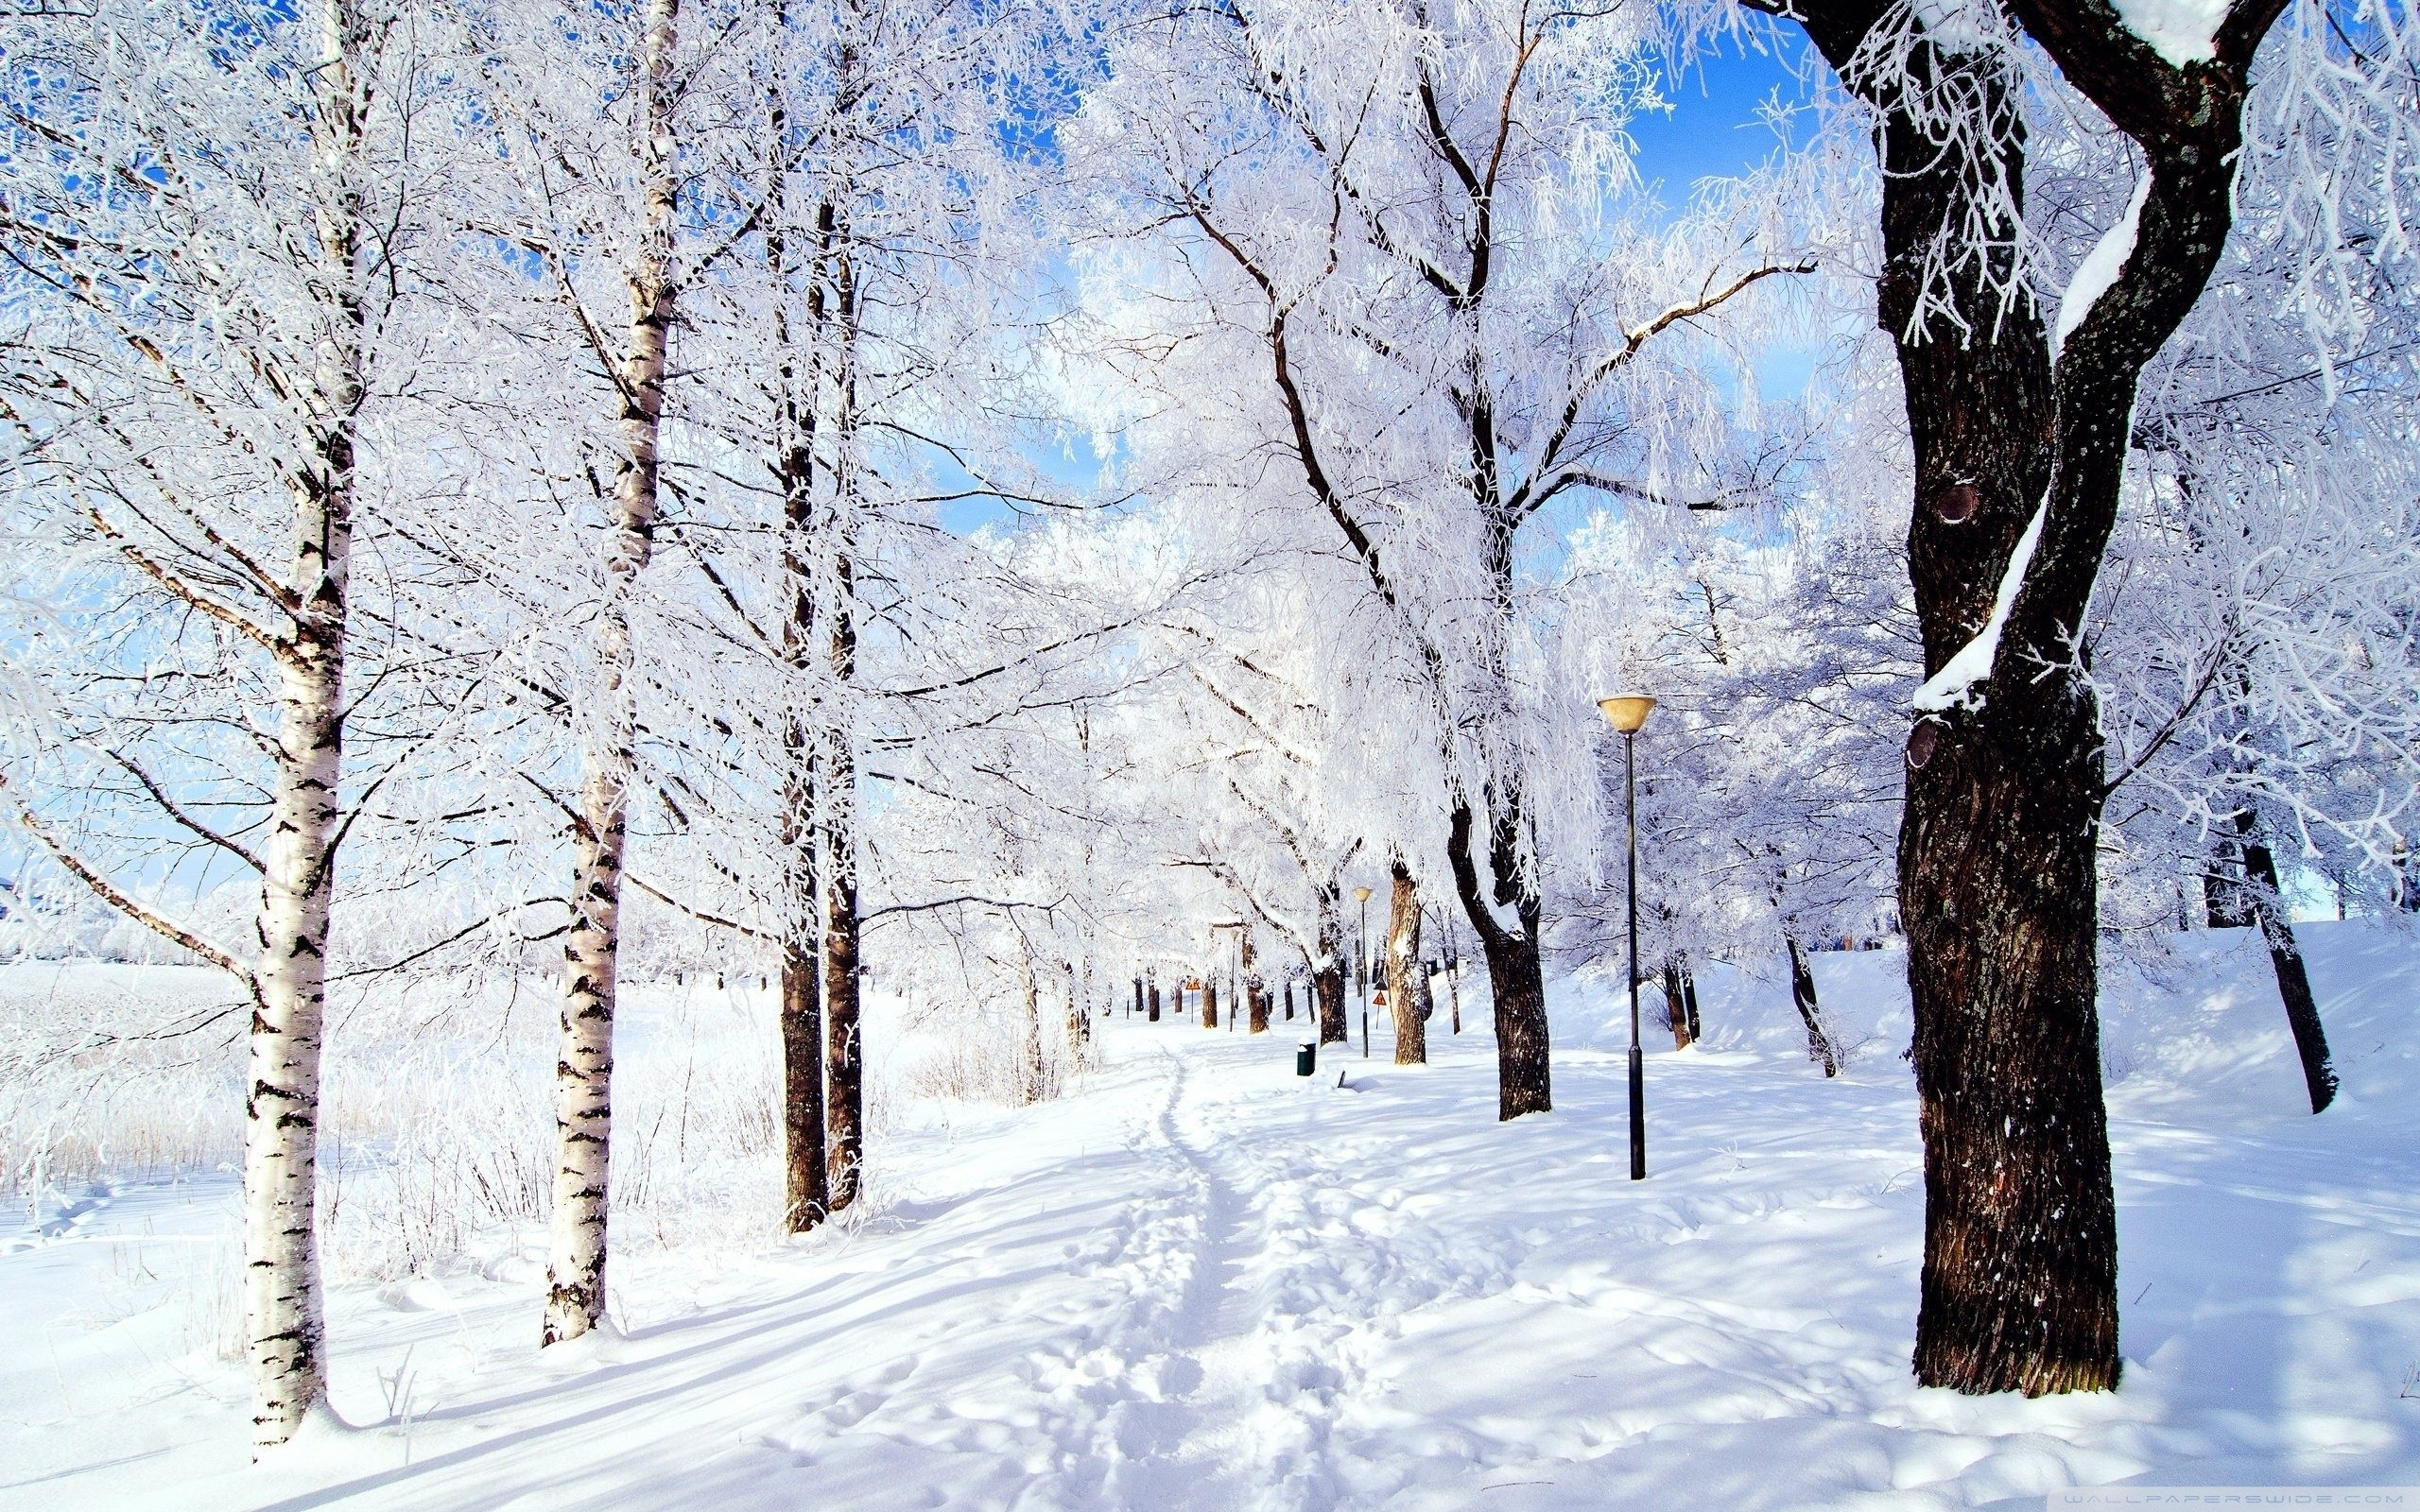 nature & landscape winter wonderland wallpapers (desktop, phone